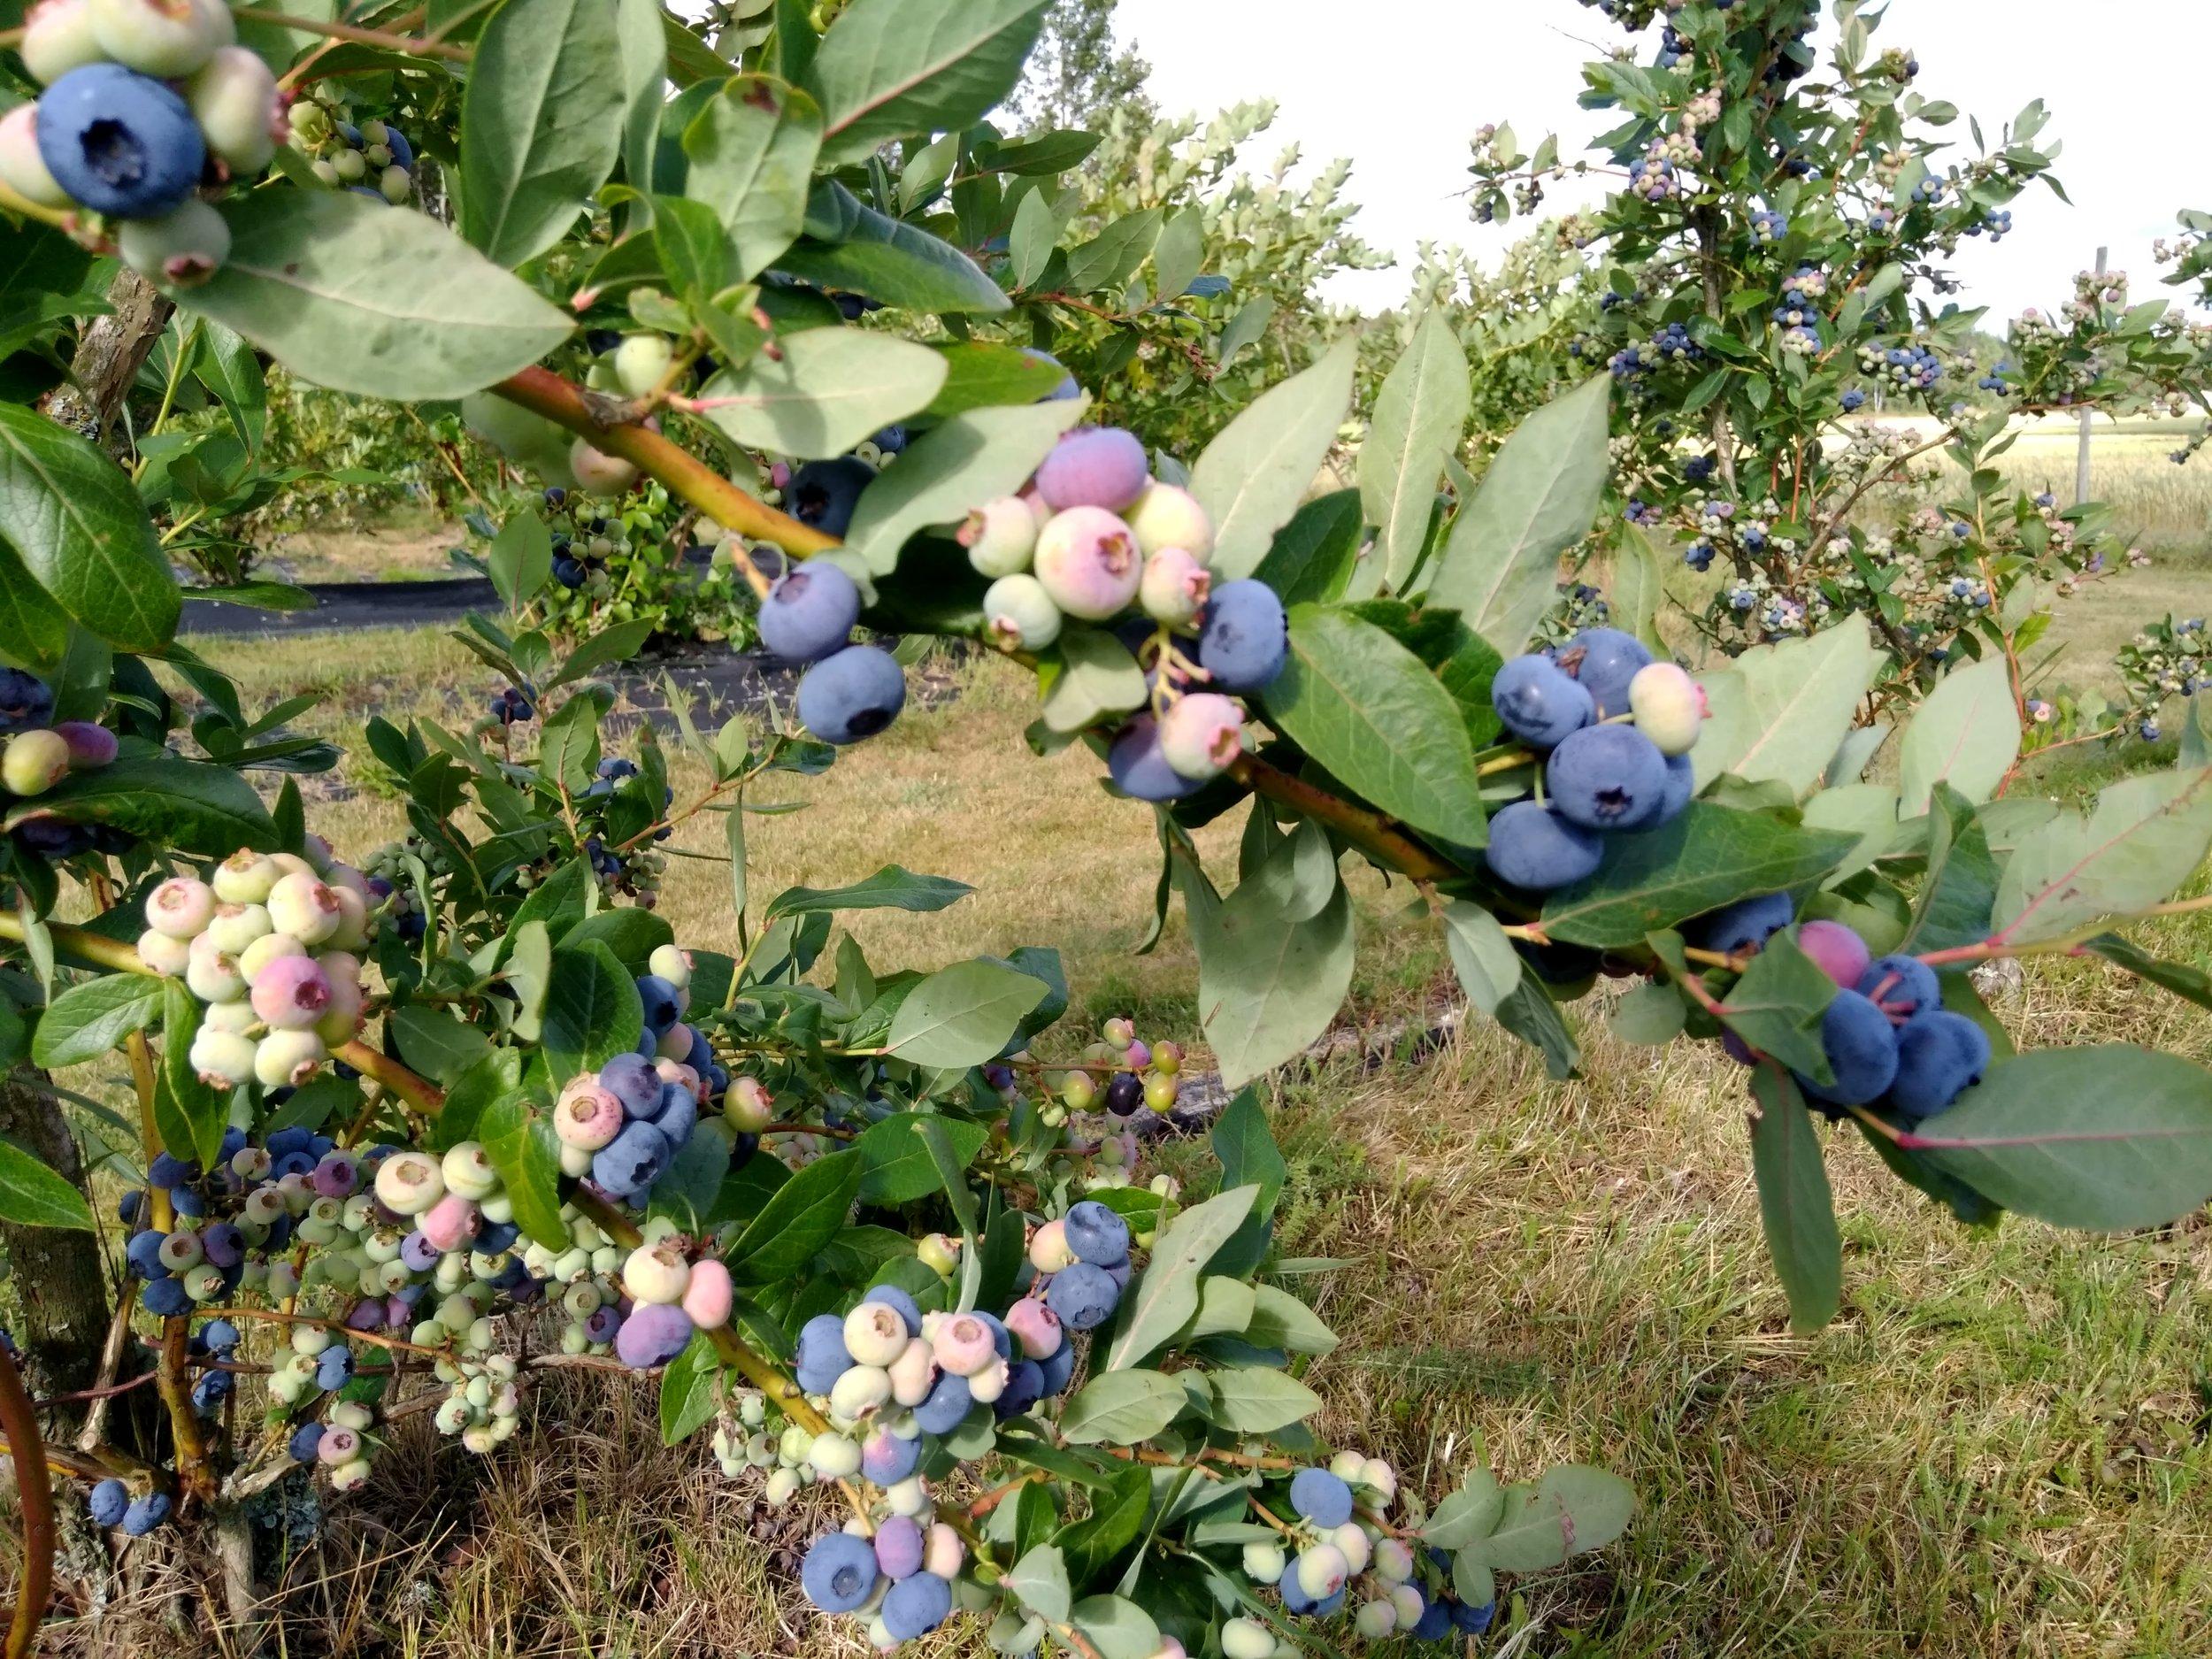 Hageblåbær, sunt og godt